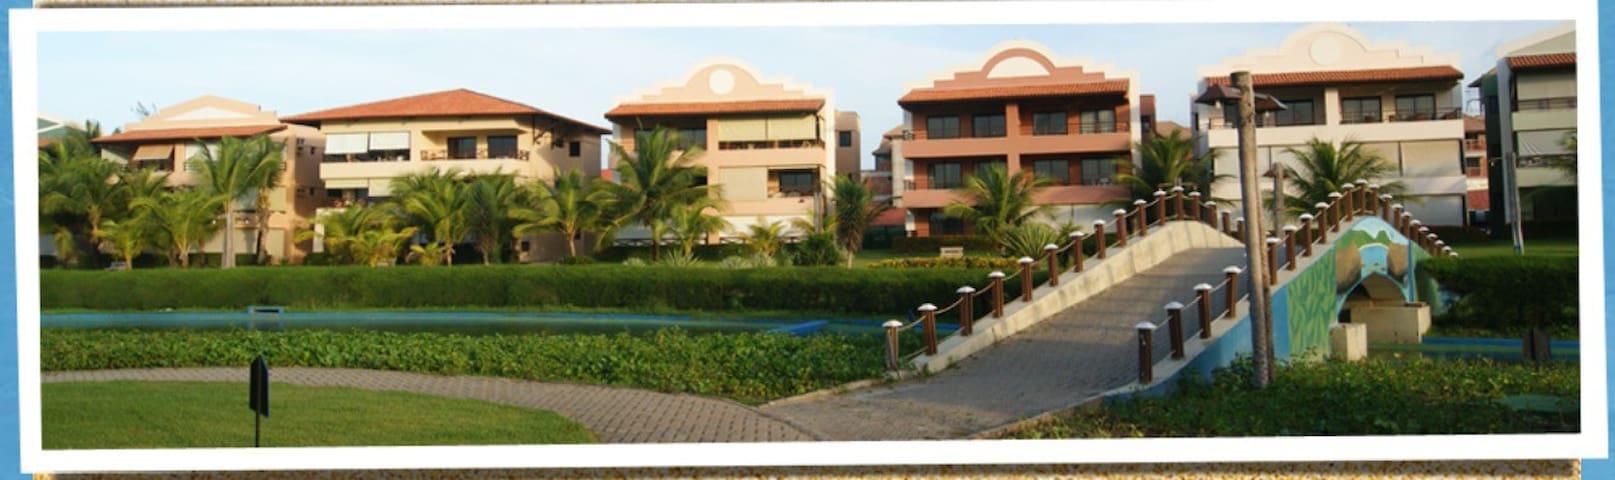 Apartamento Resort Aquaville - Fortaleza - Apartamento